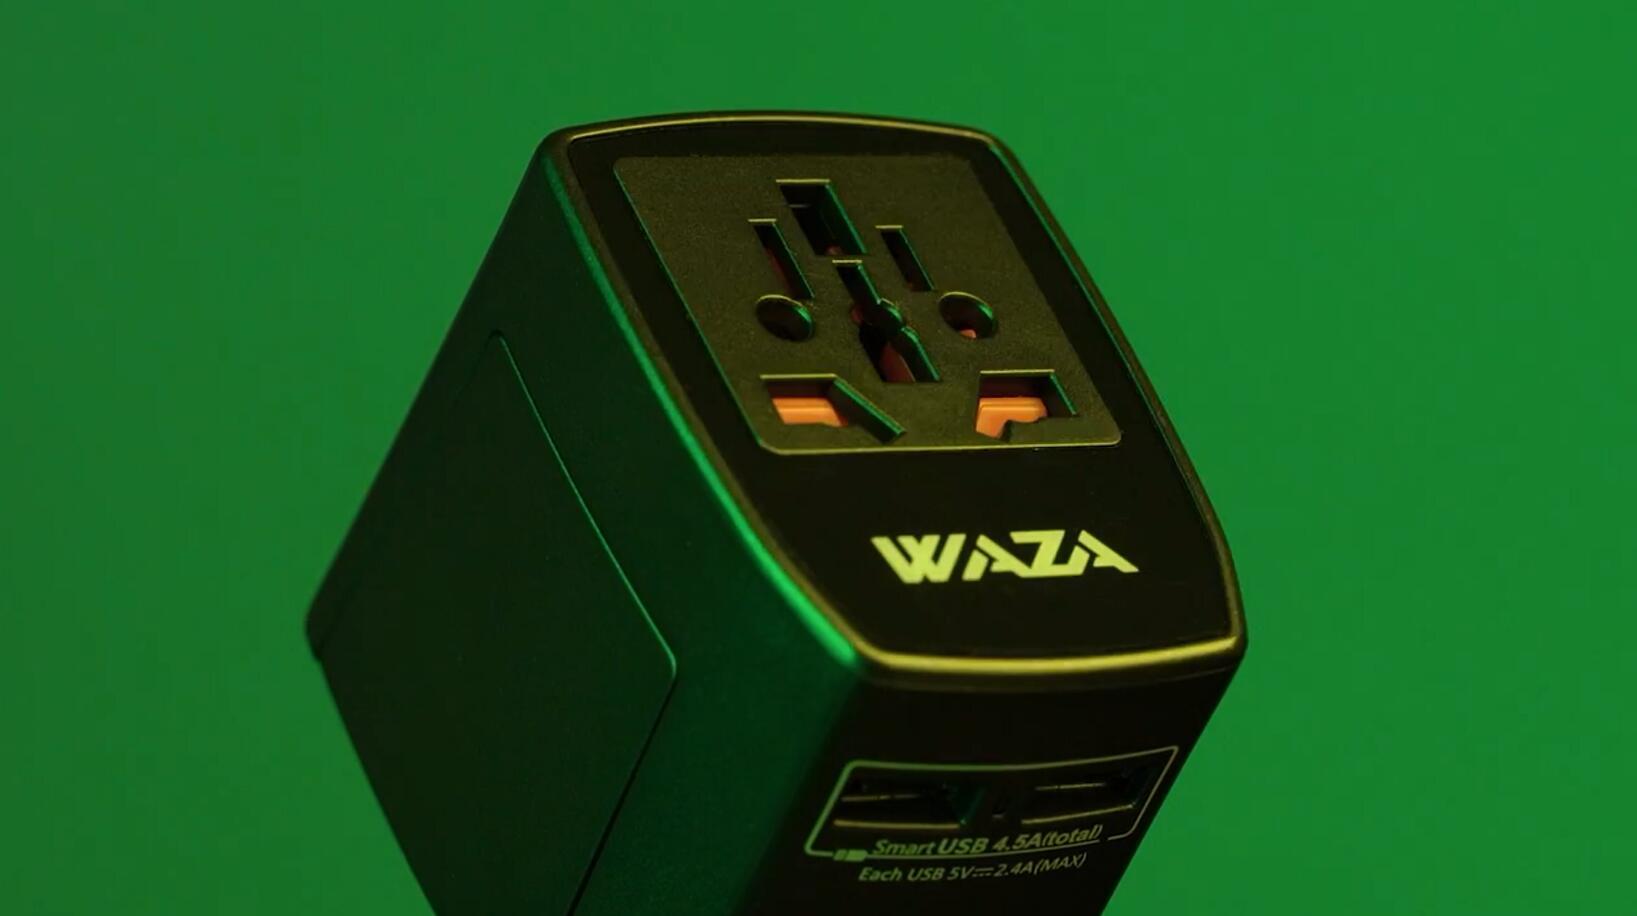 WAZA旅行插頭 產品宣傳片